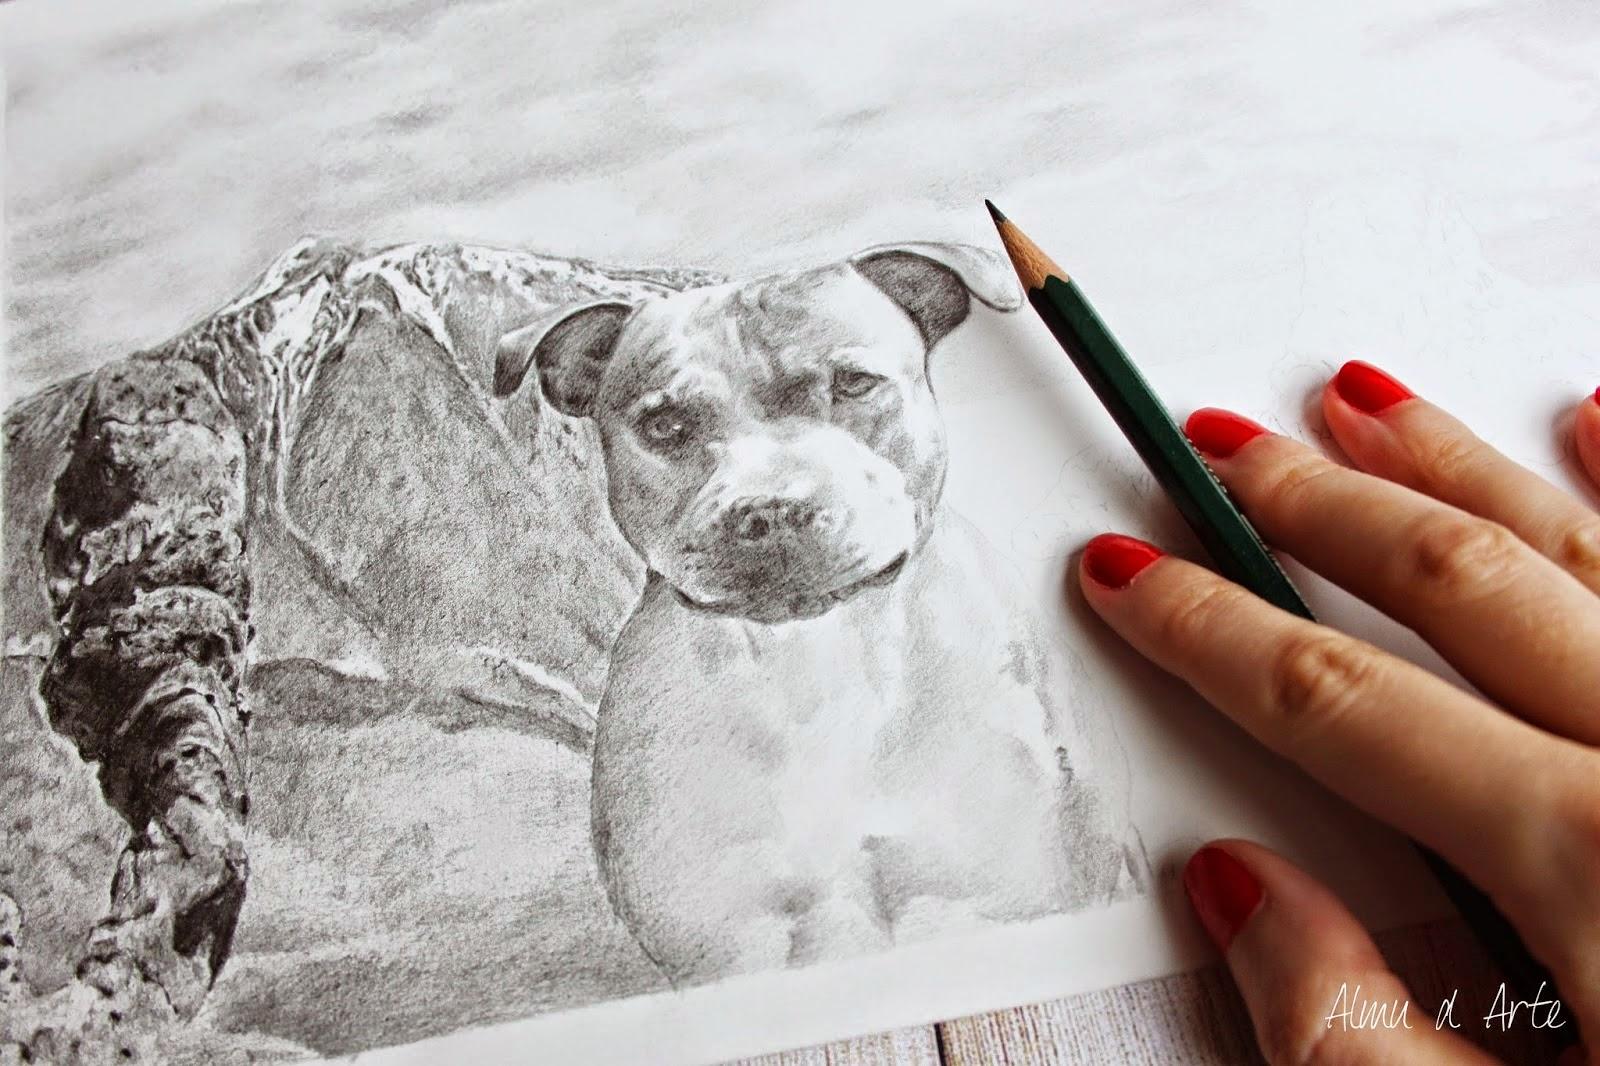 Dibujo realista a lápiz de un perro